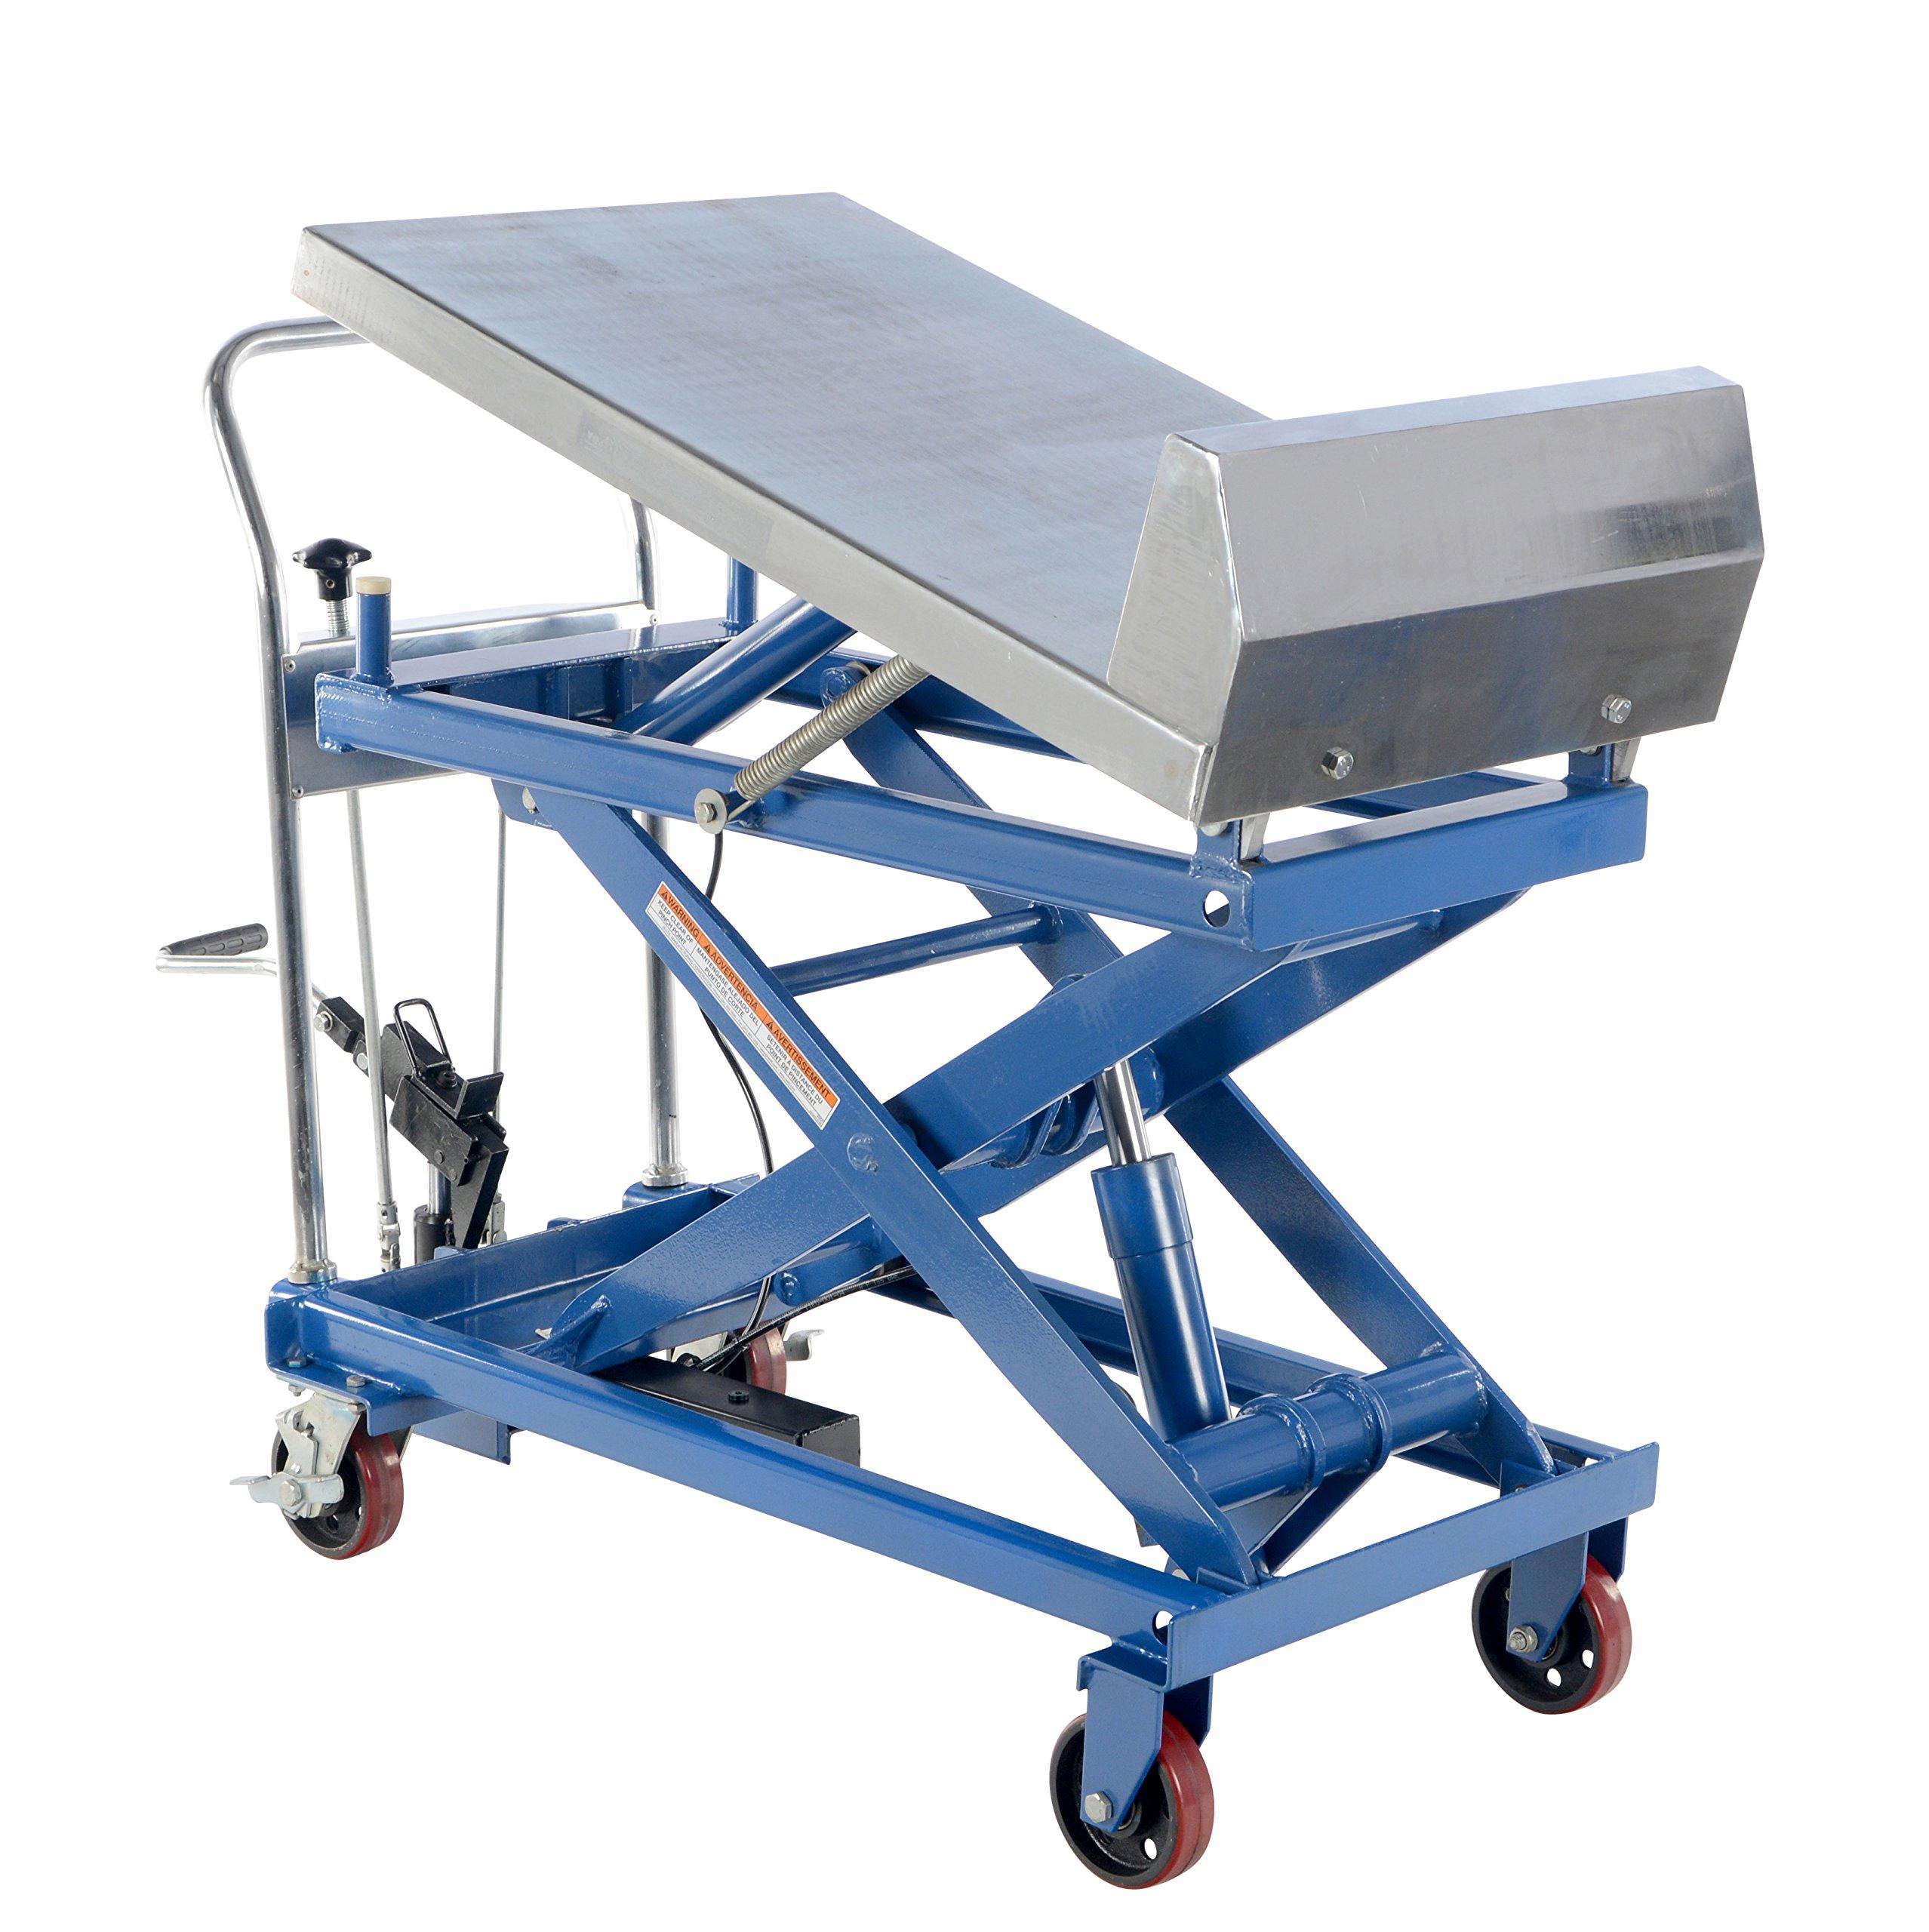 Vestil CART-1000-LT Steel Lift and Tilt Cart with Sequence Select, 1,000 lb. Capacity, 33-1/2'' x 17-5/8'' Platform